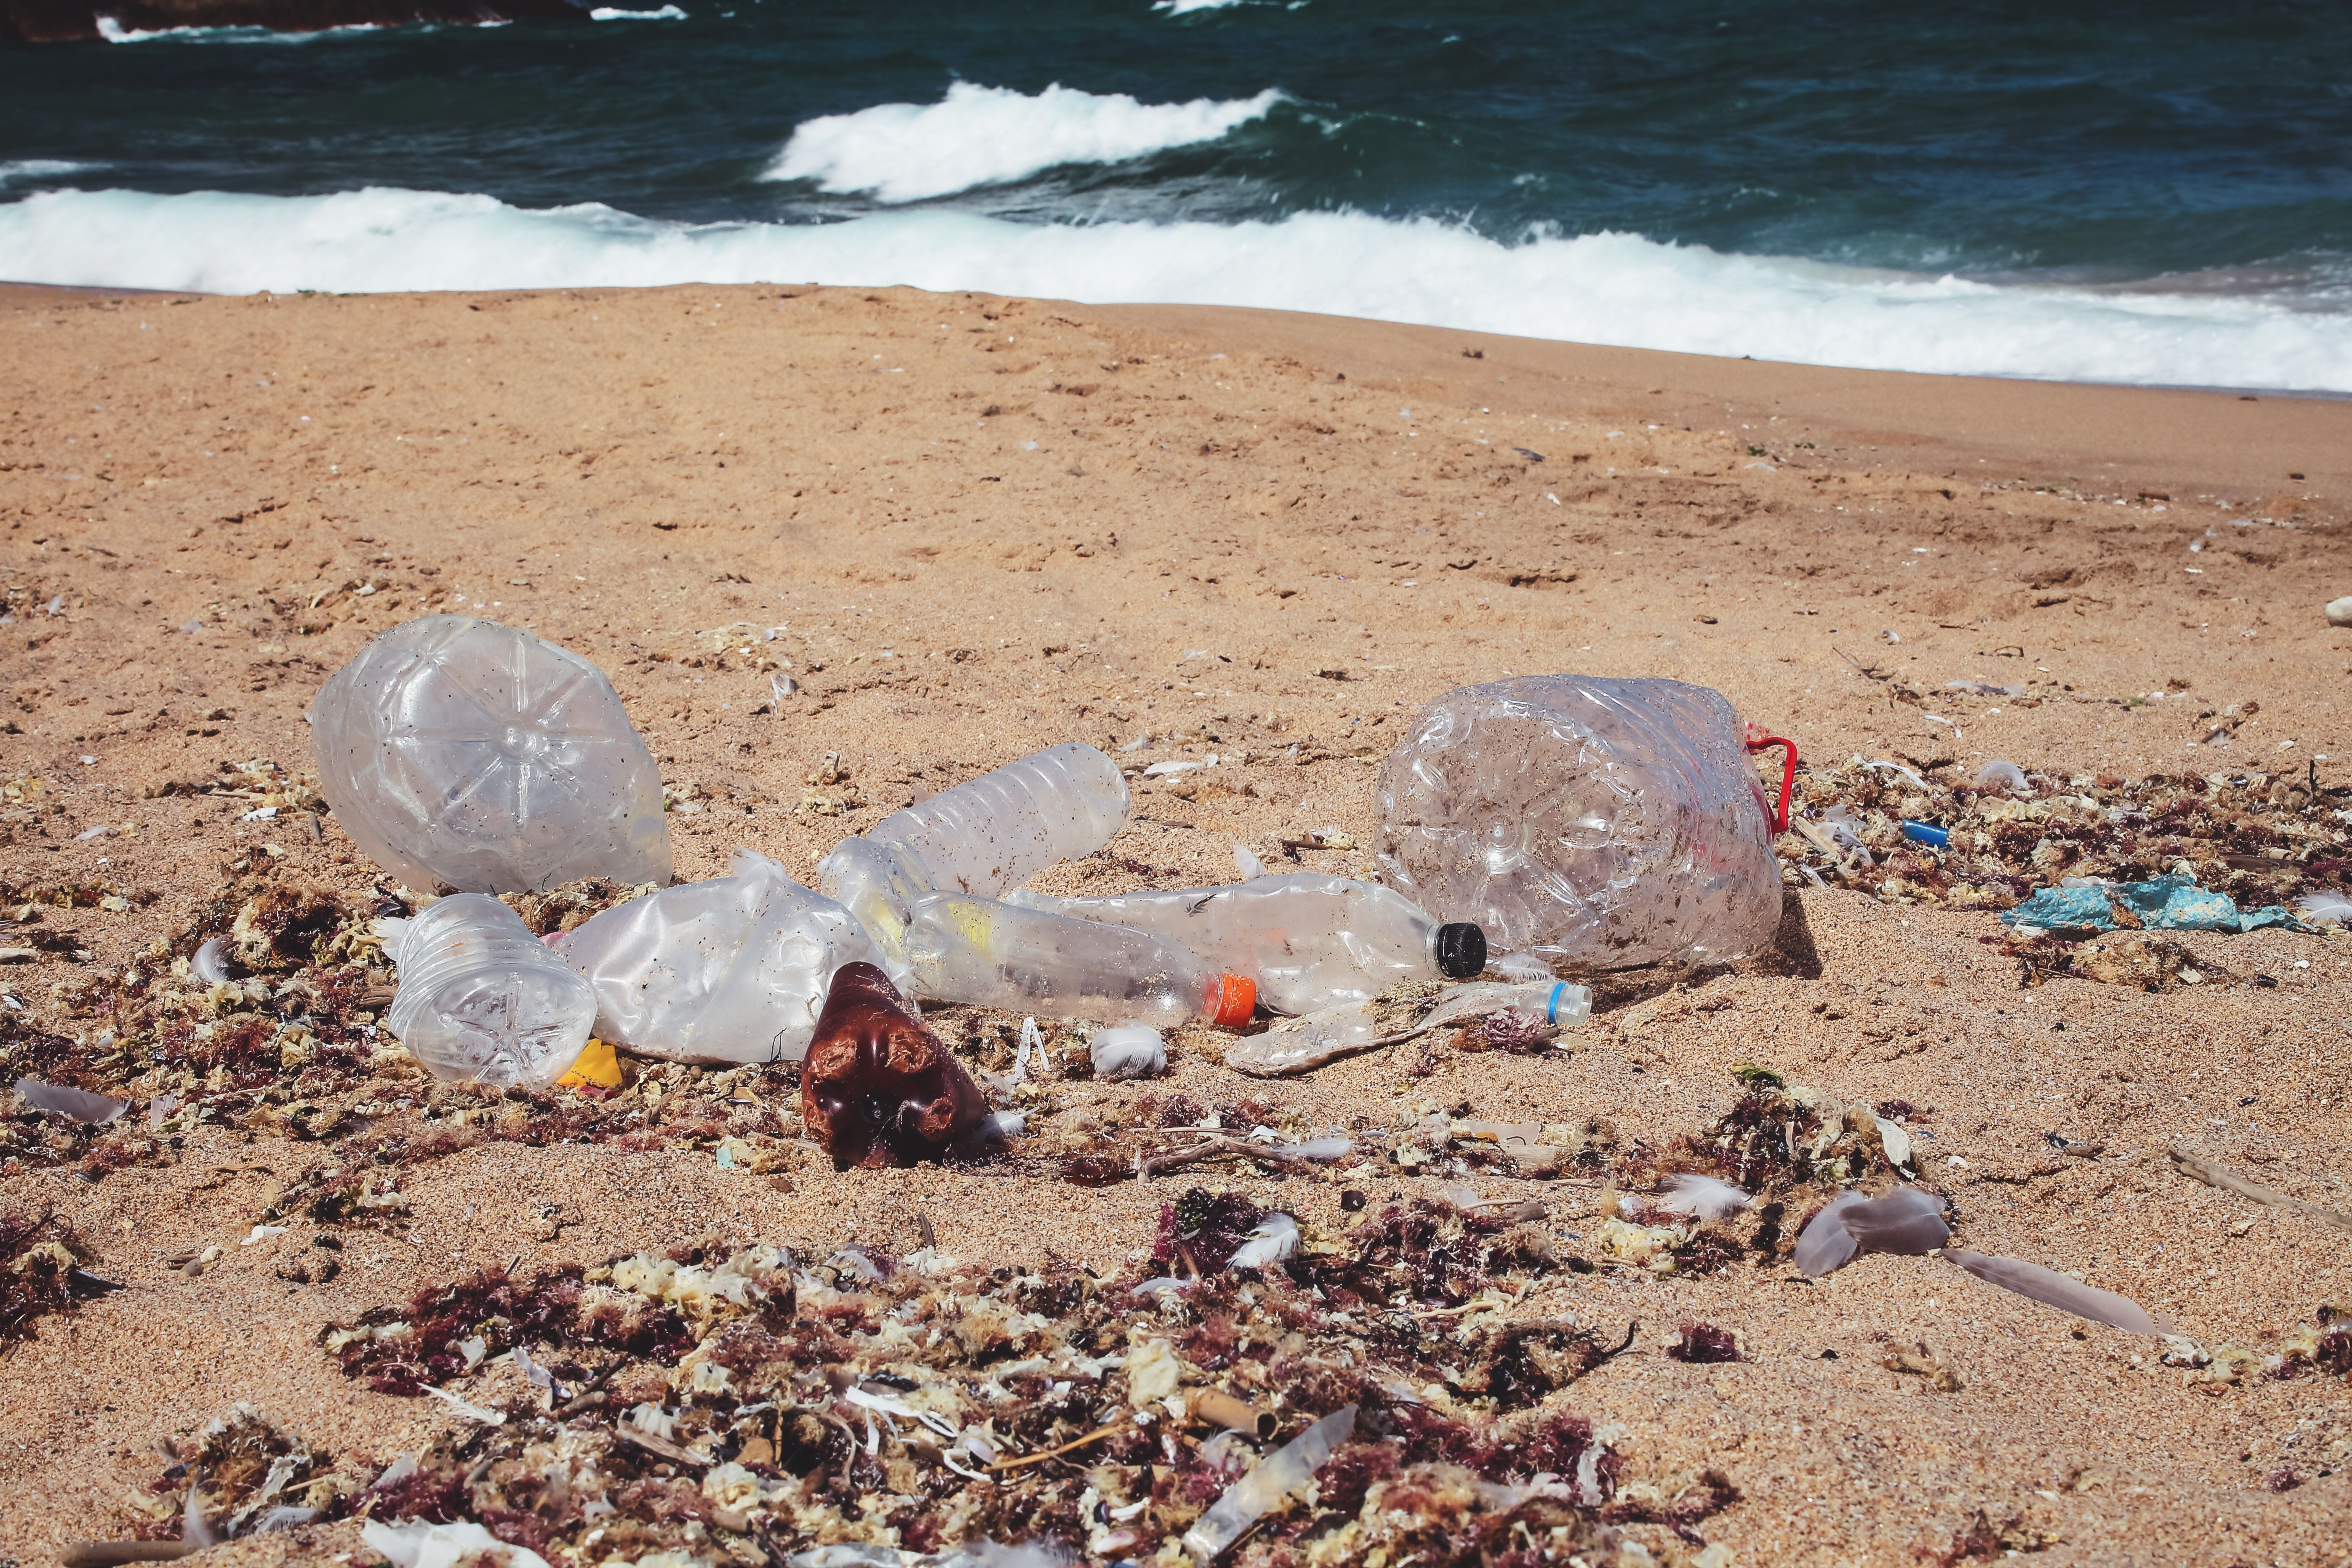 Coca-Cola, PepsiCo And Nestlé Are 'Top Plastic Polluters' On